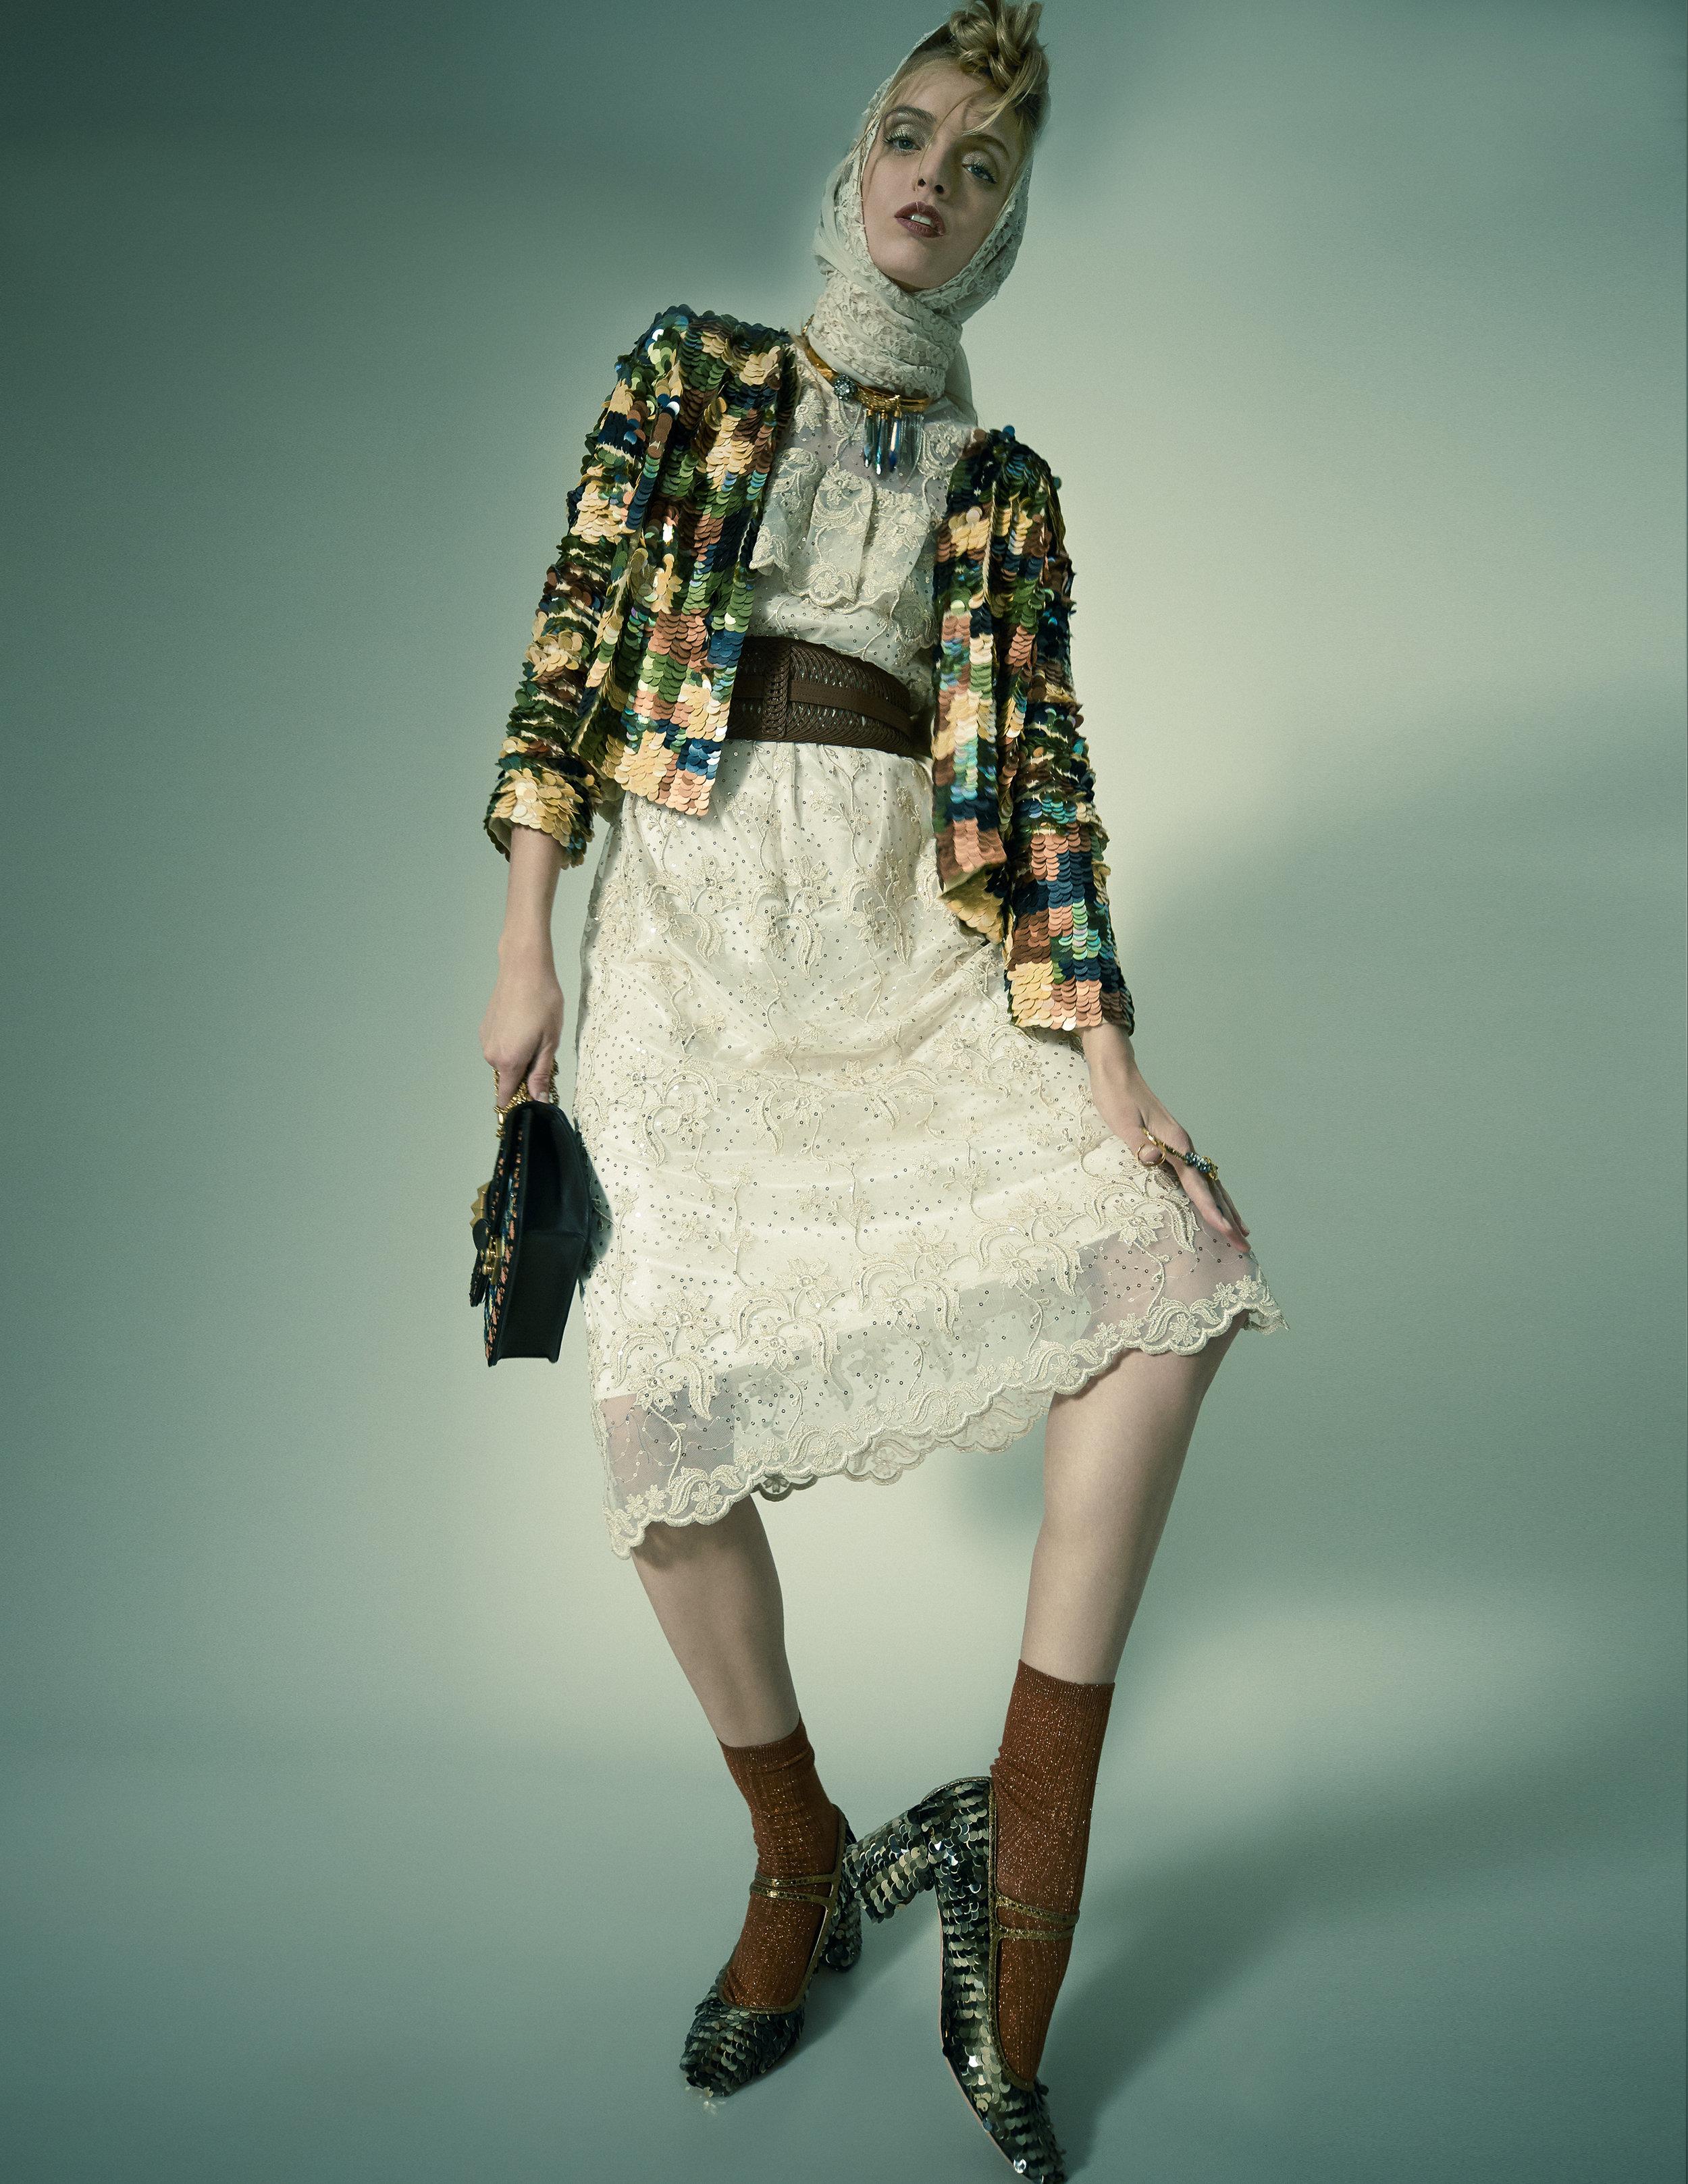 Dress – Soma Jacket – L'Autre Chose Scarf/foulard – Hidy N.G. Bag – ValentinoShoes – RochasRing – Sciumé